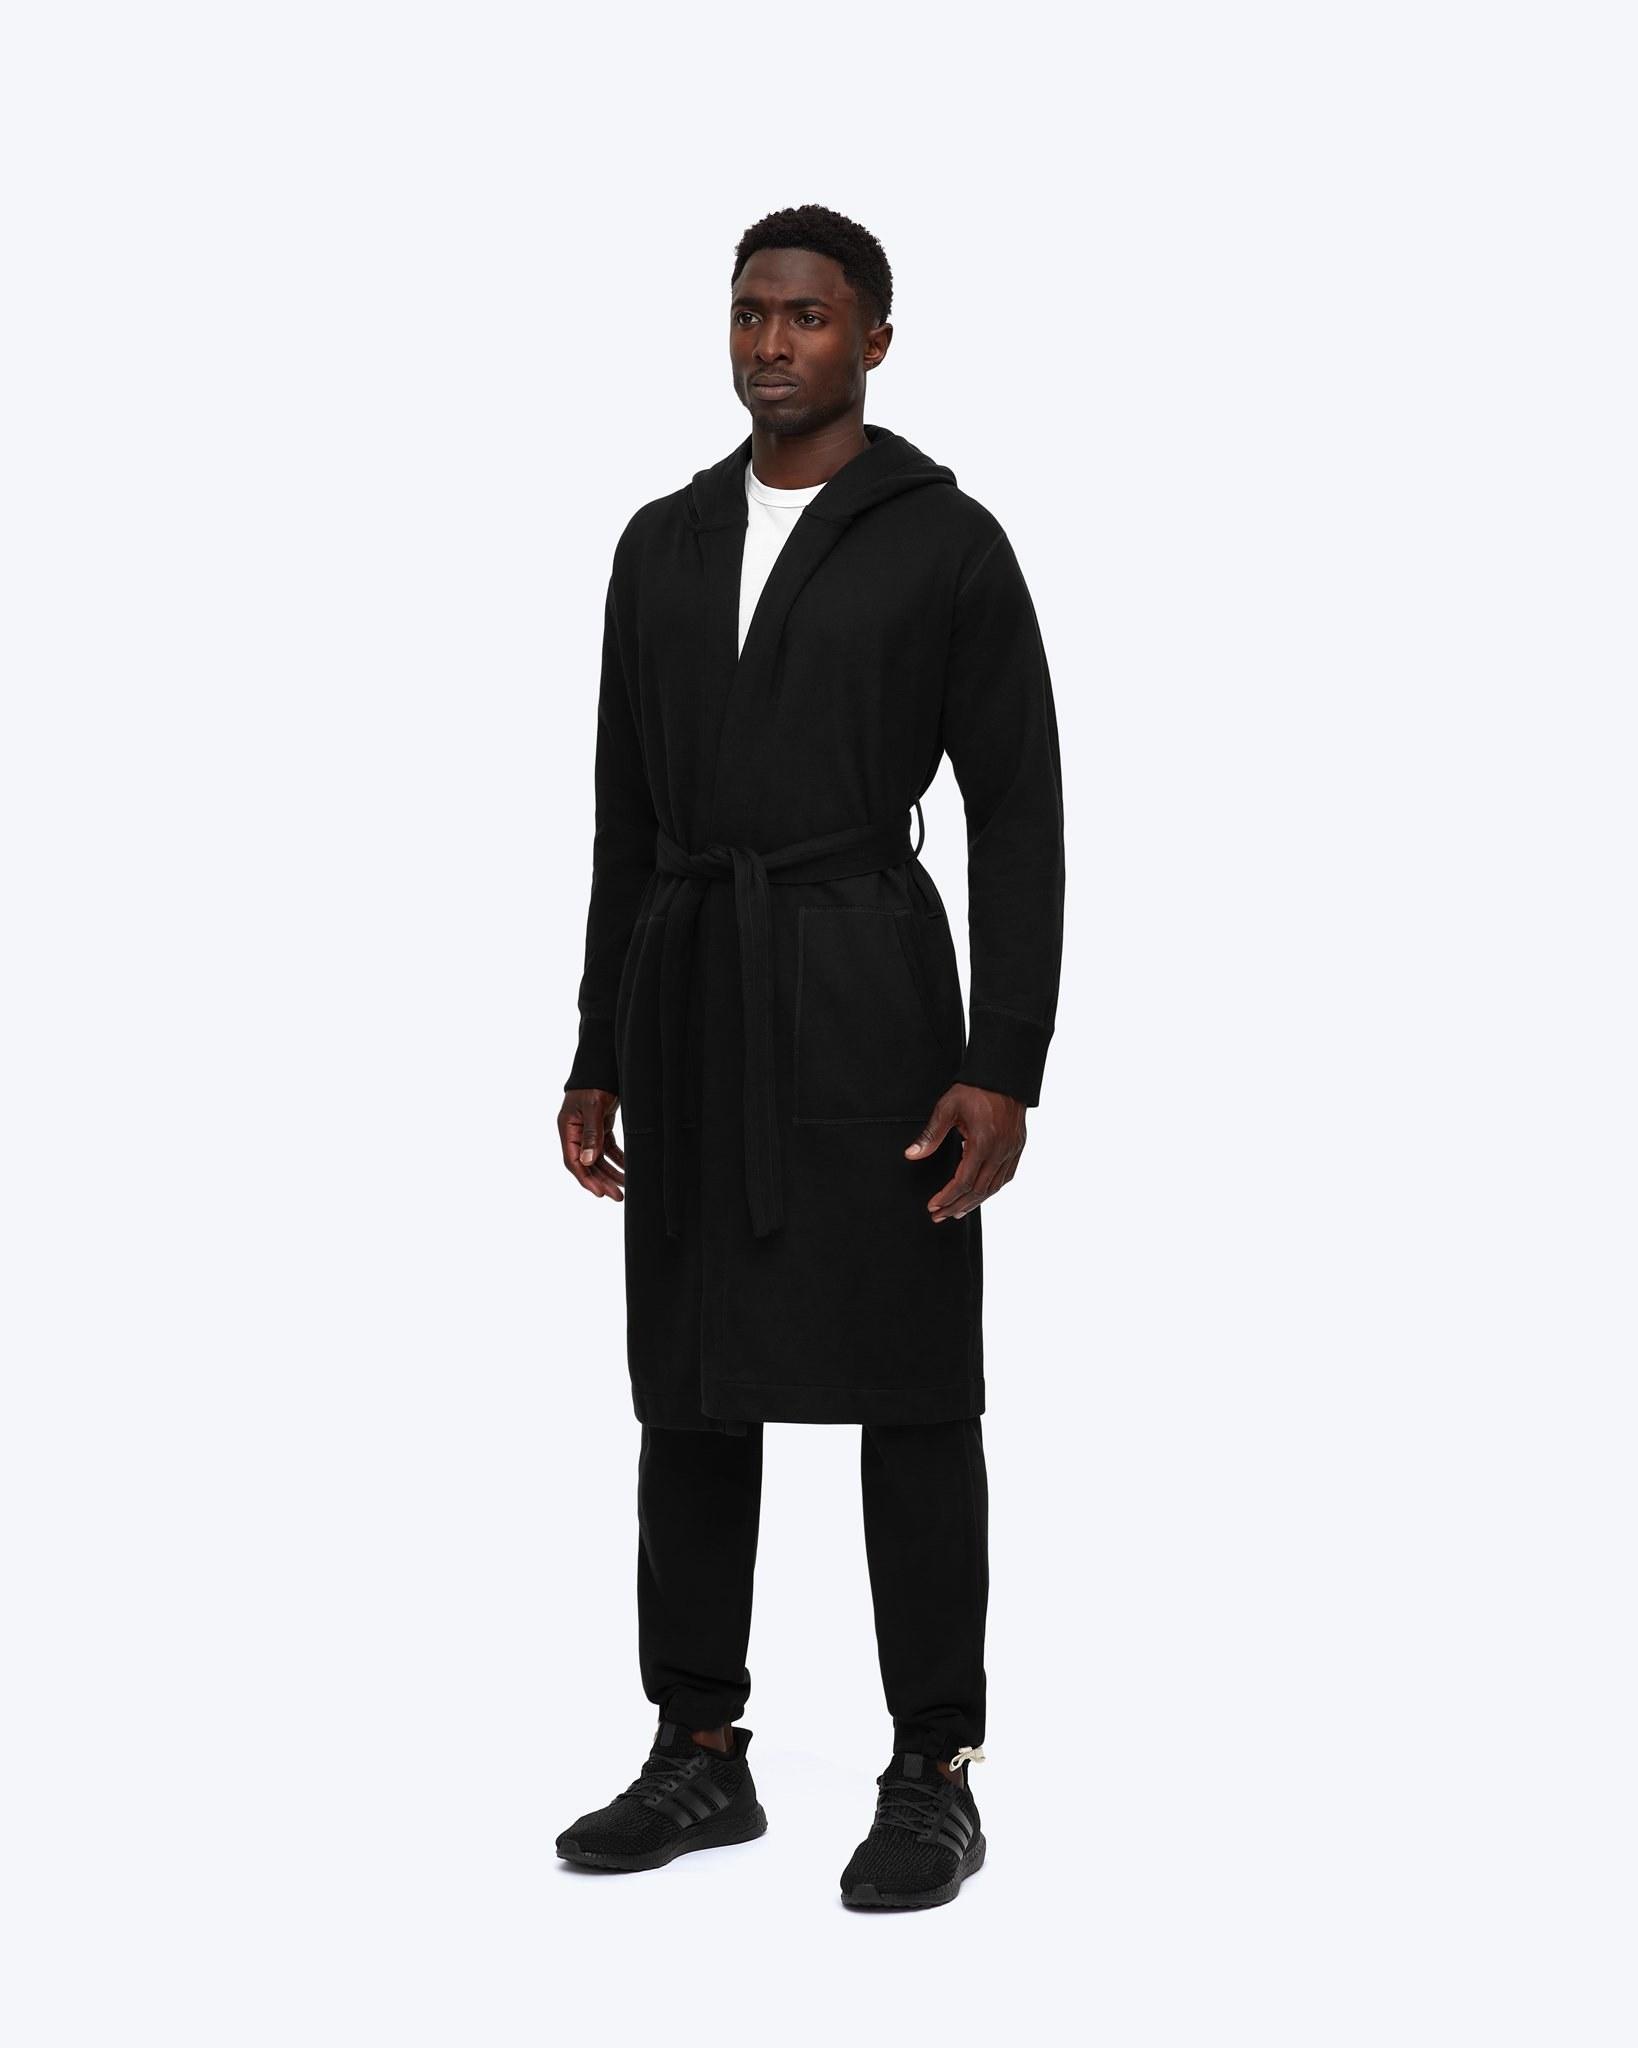 Model wearing black Reigning Champ robe